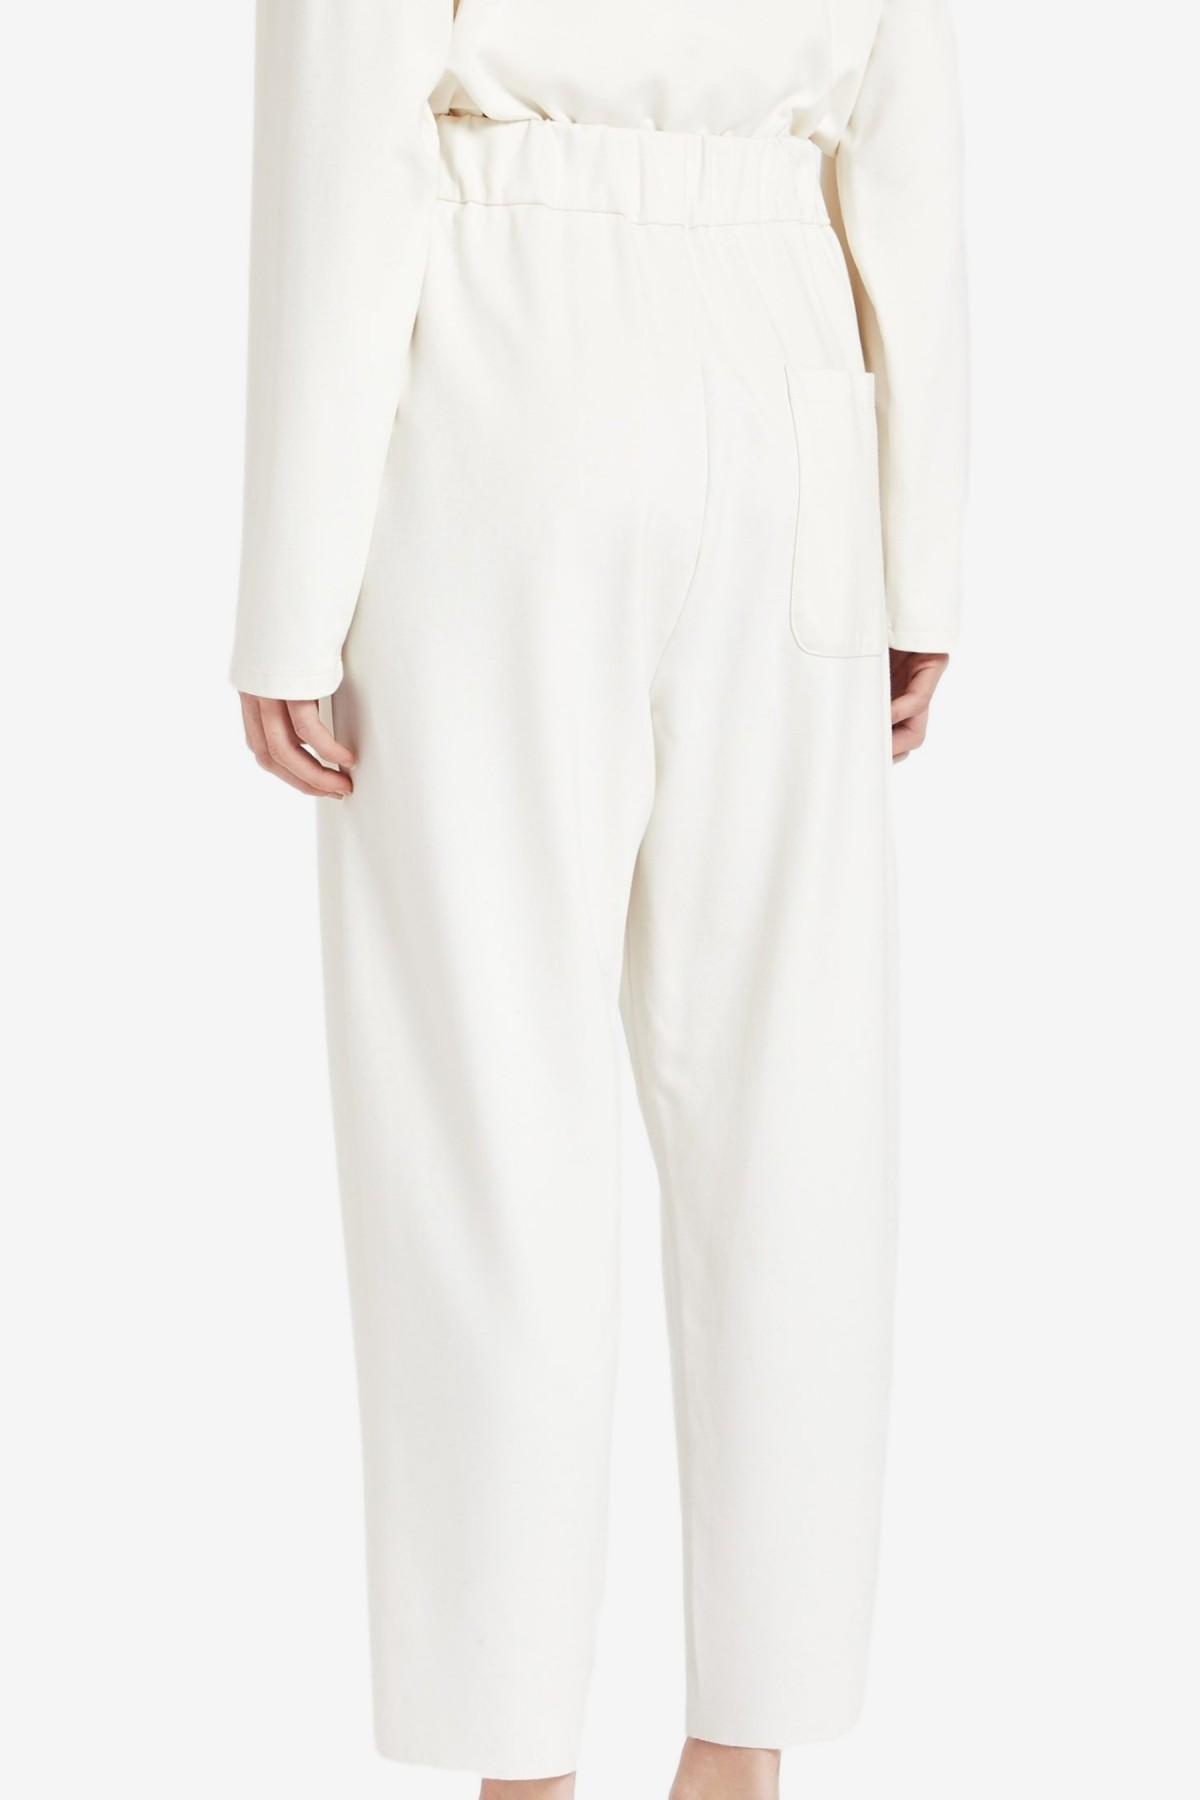 Barena Venezia Trousers Joie Isso in Bianco